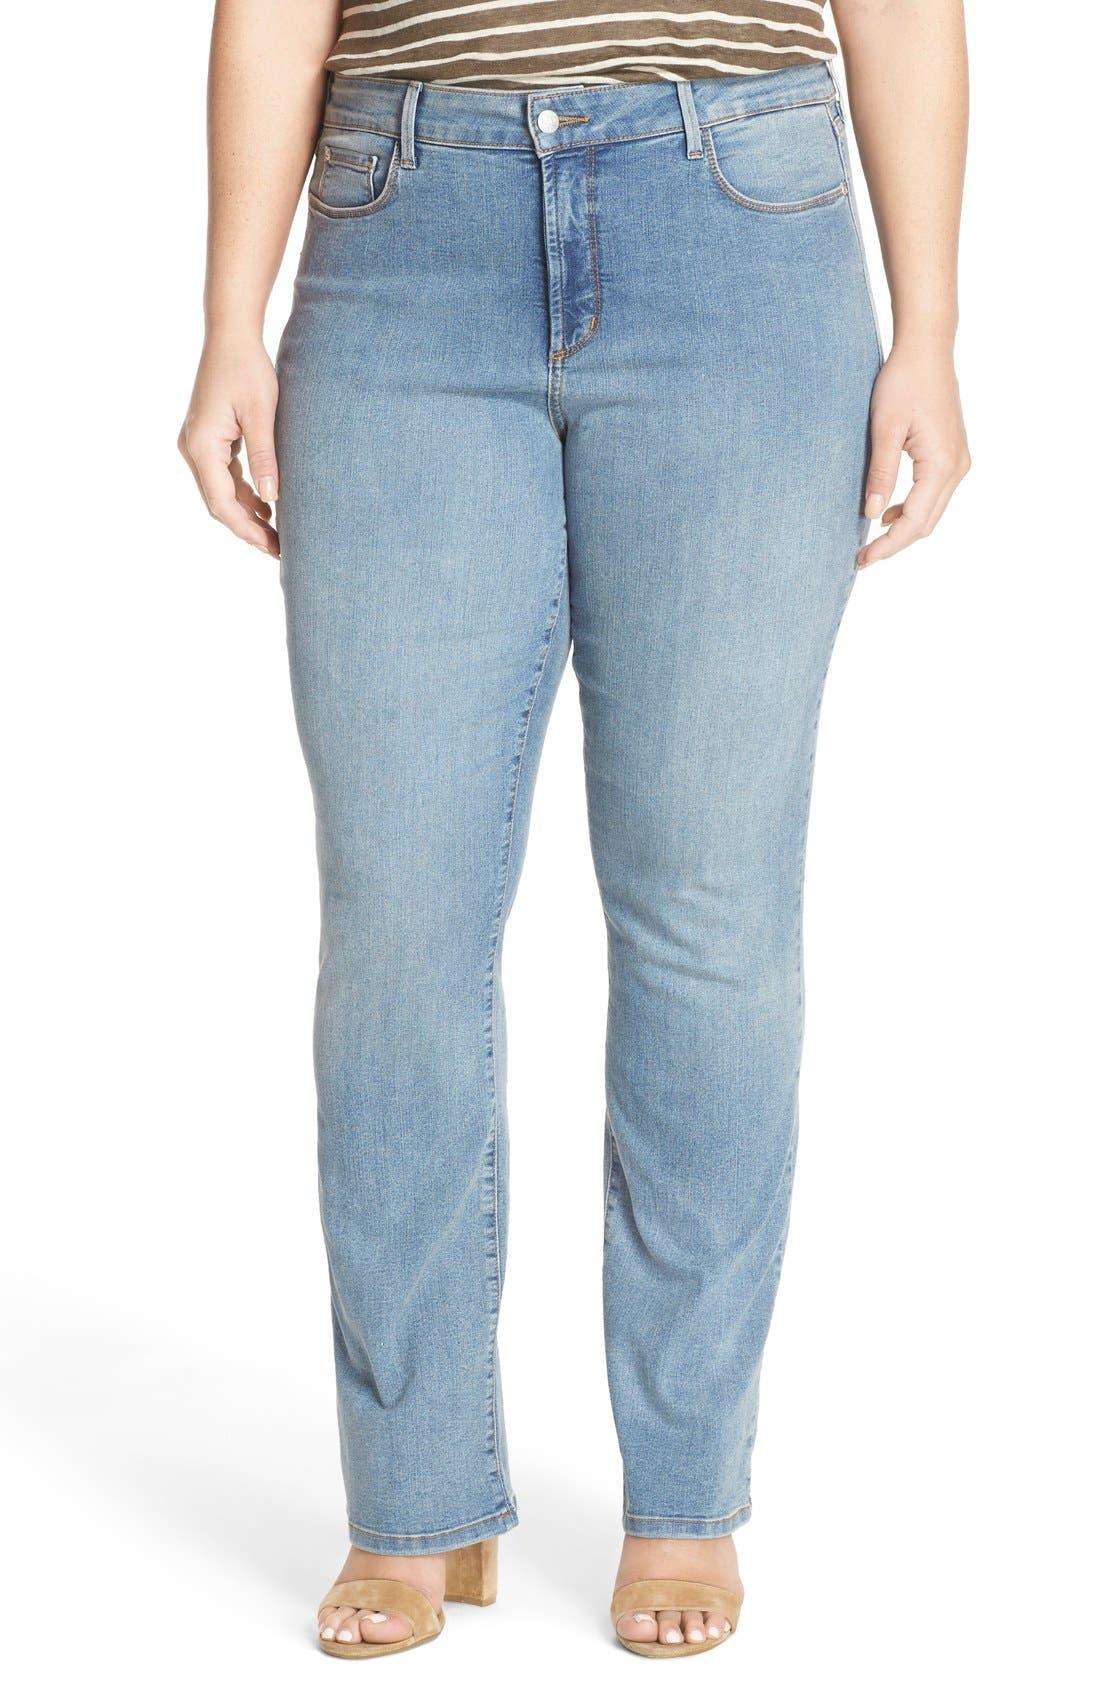 Alternate Image 1 Selected - NYDJ 'Billie' Stretch Mini Bootcut Jeans (Plus Size)